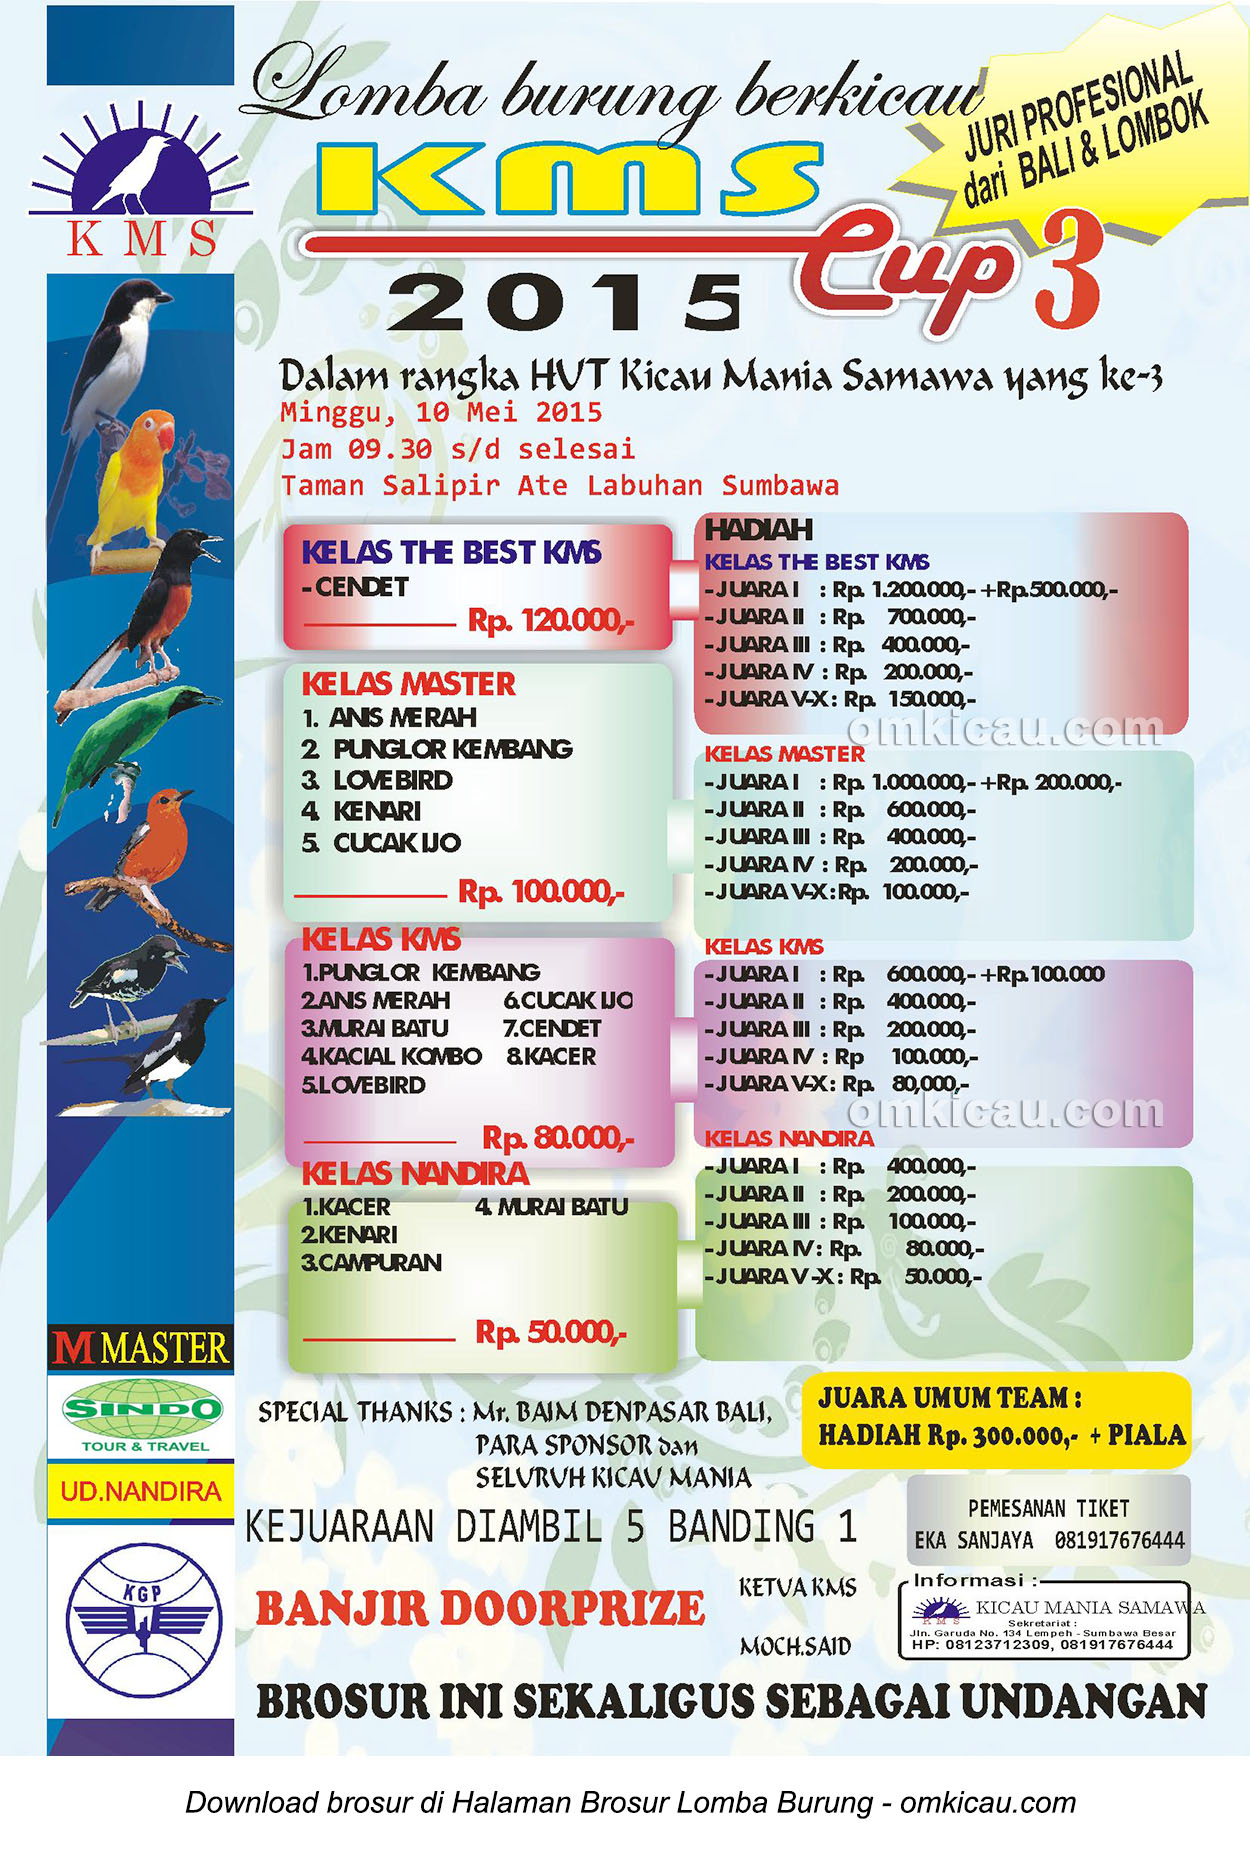 Brosur Lomba Burung Berkicau KMS Cup 3, Sumbawa, 10 Mei 2015